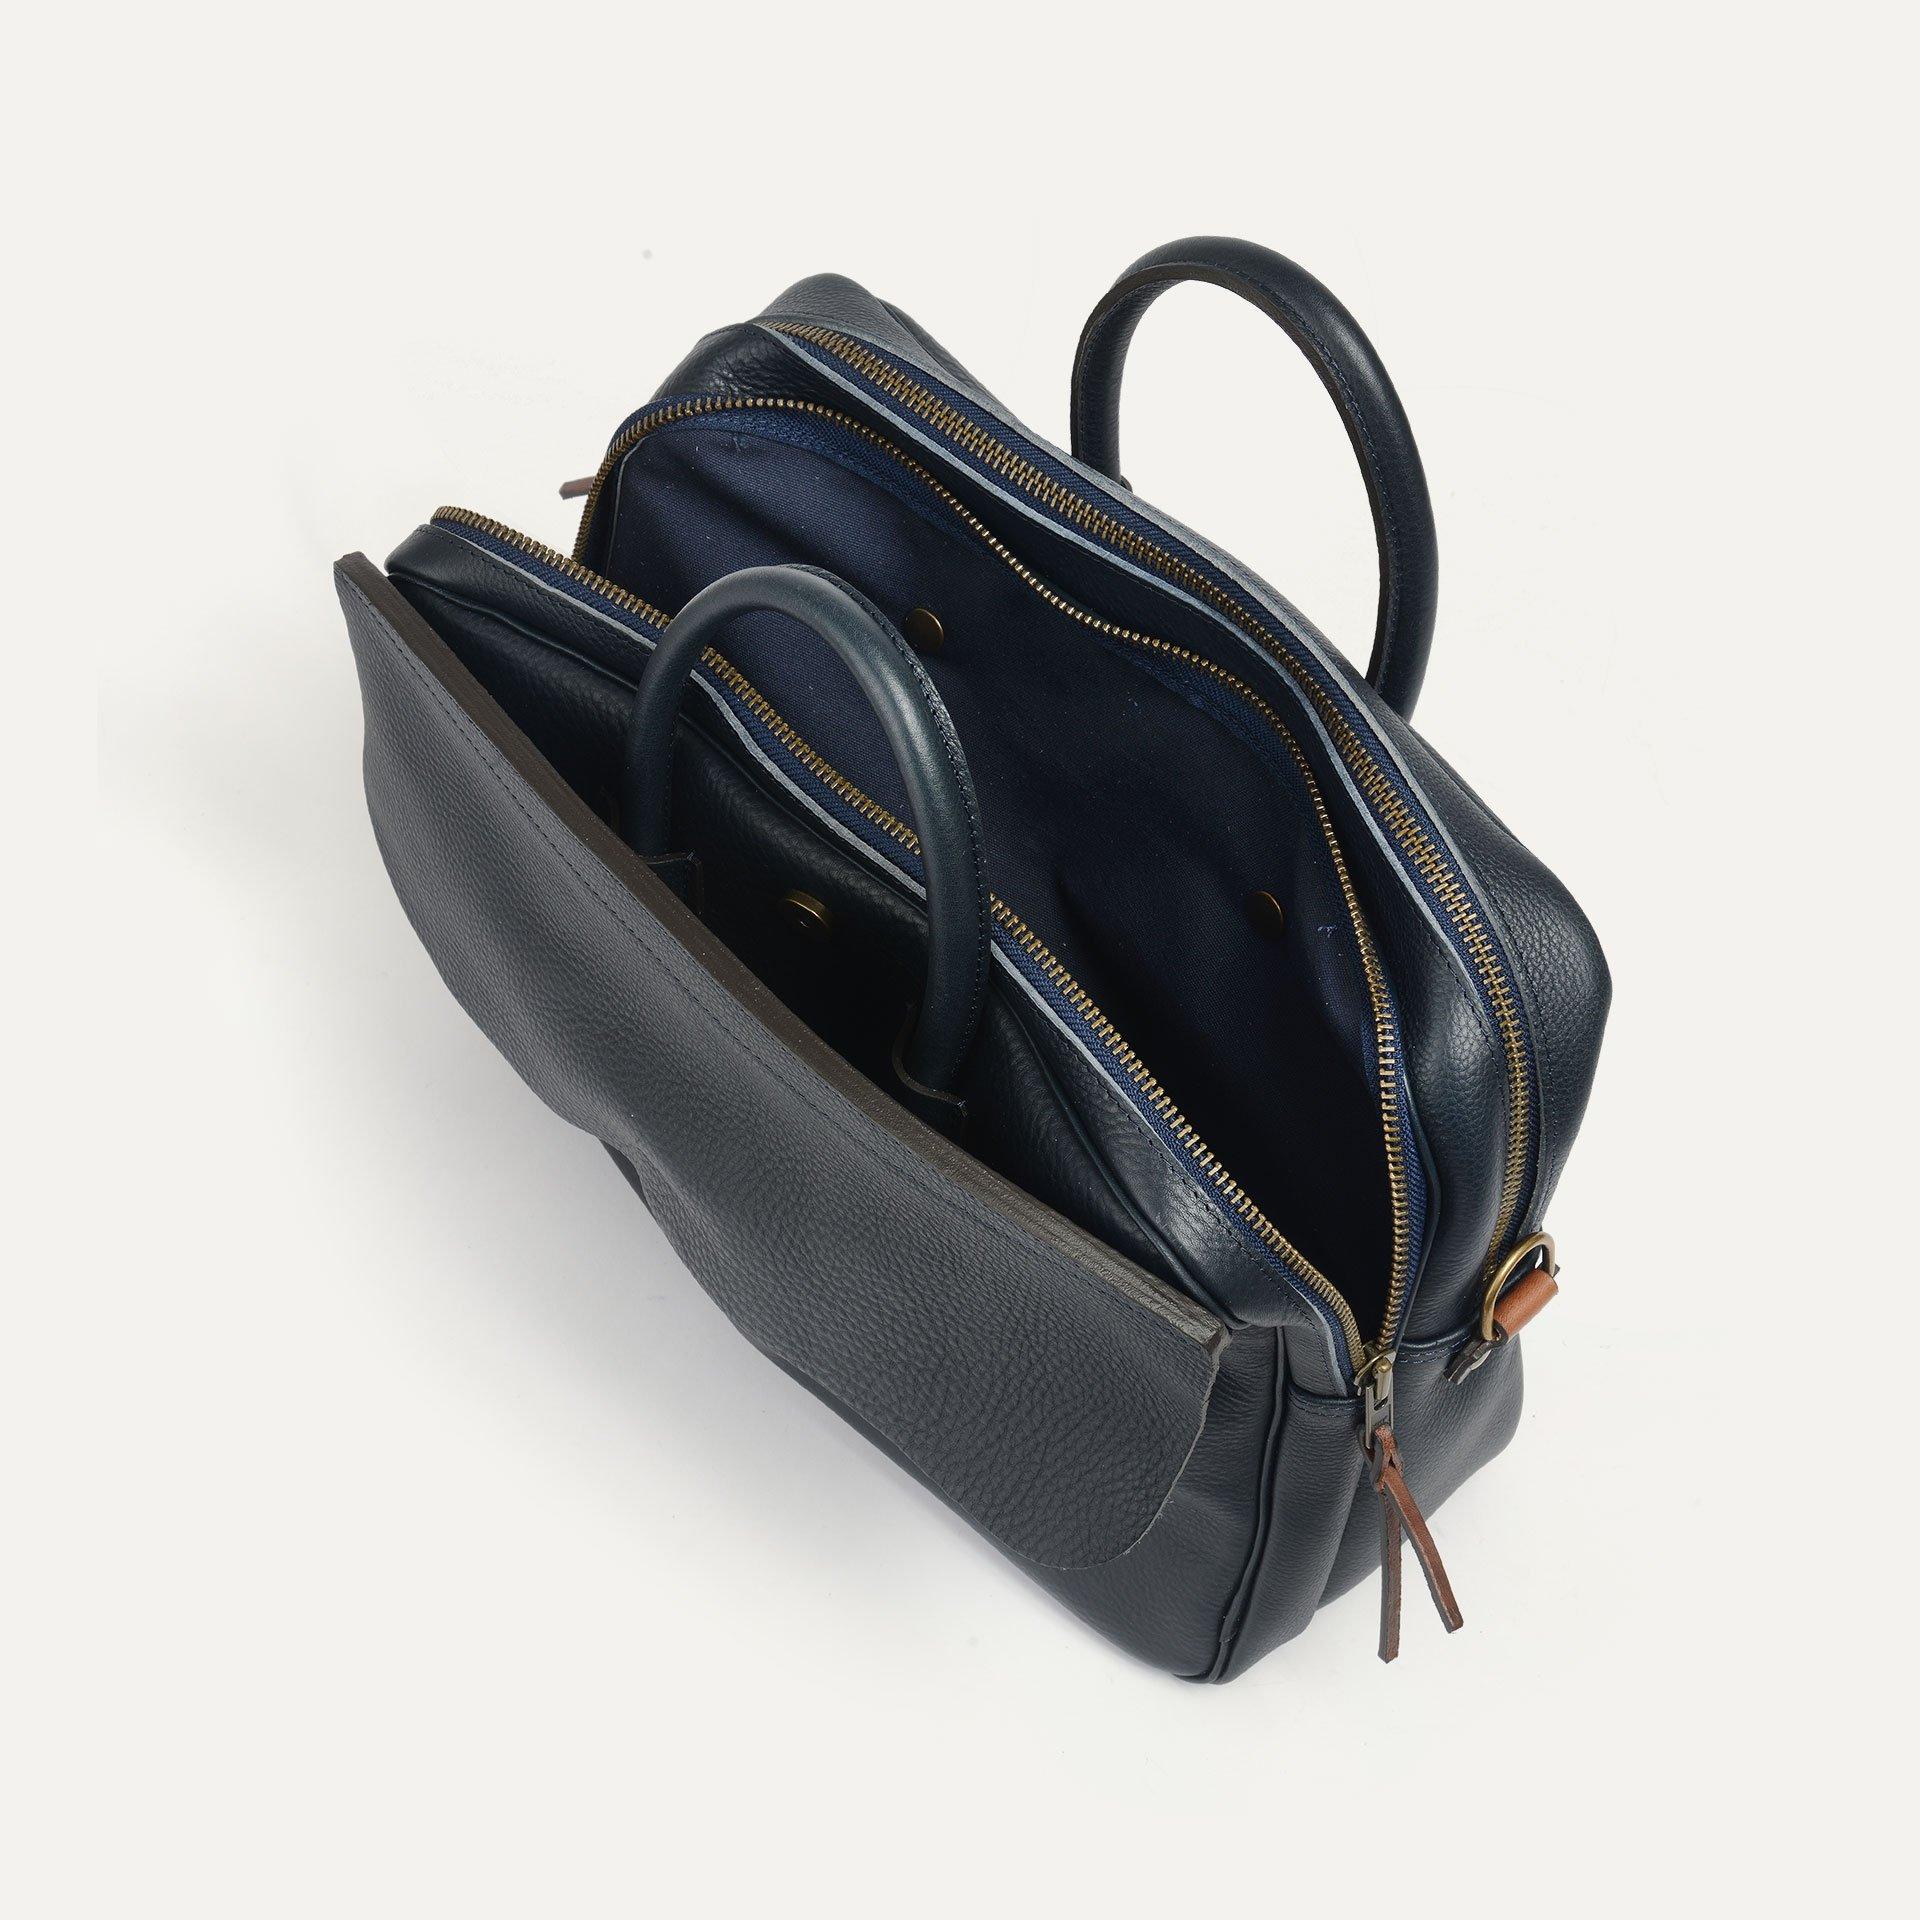 Zeppo Business bag - Navy Blue / E Pure (image n°6)